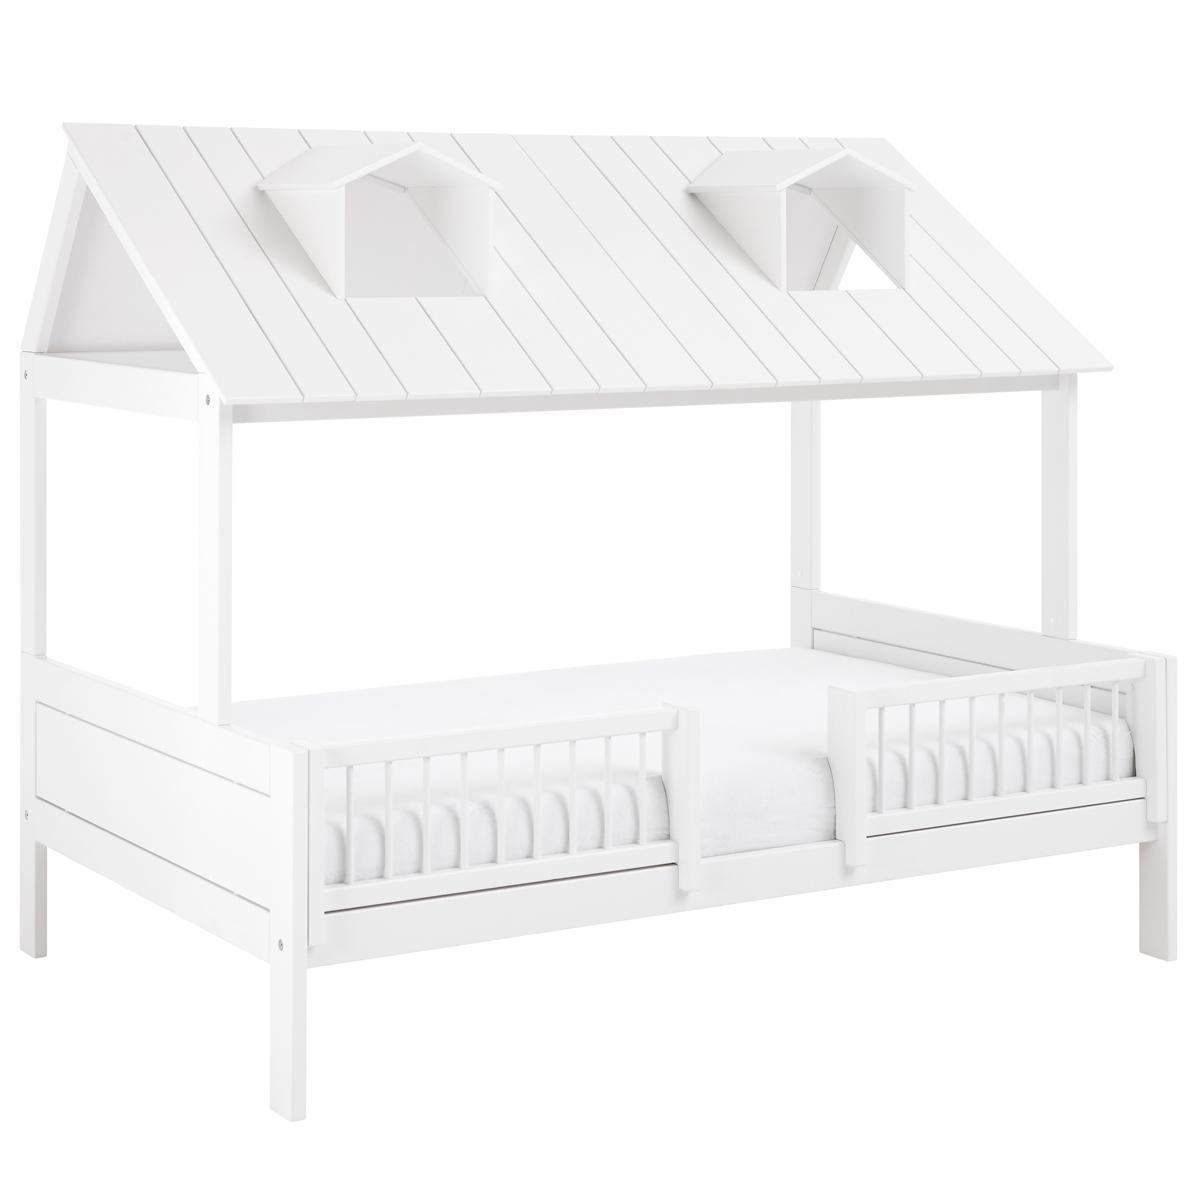 Bett mit Deluxe Lattenrost 120x200cm BEACH HOUSE Lifetime weiß